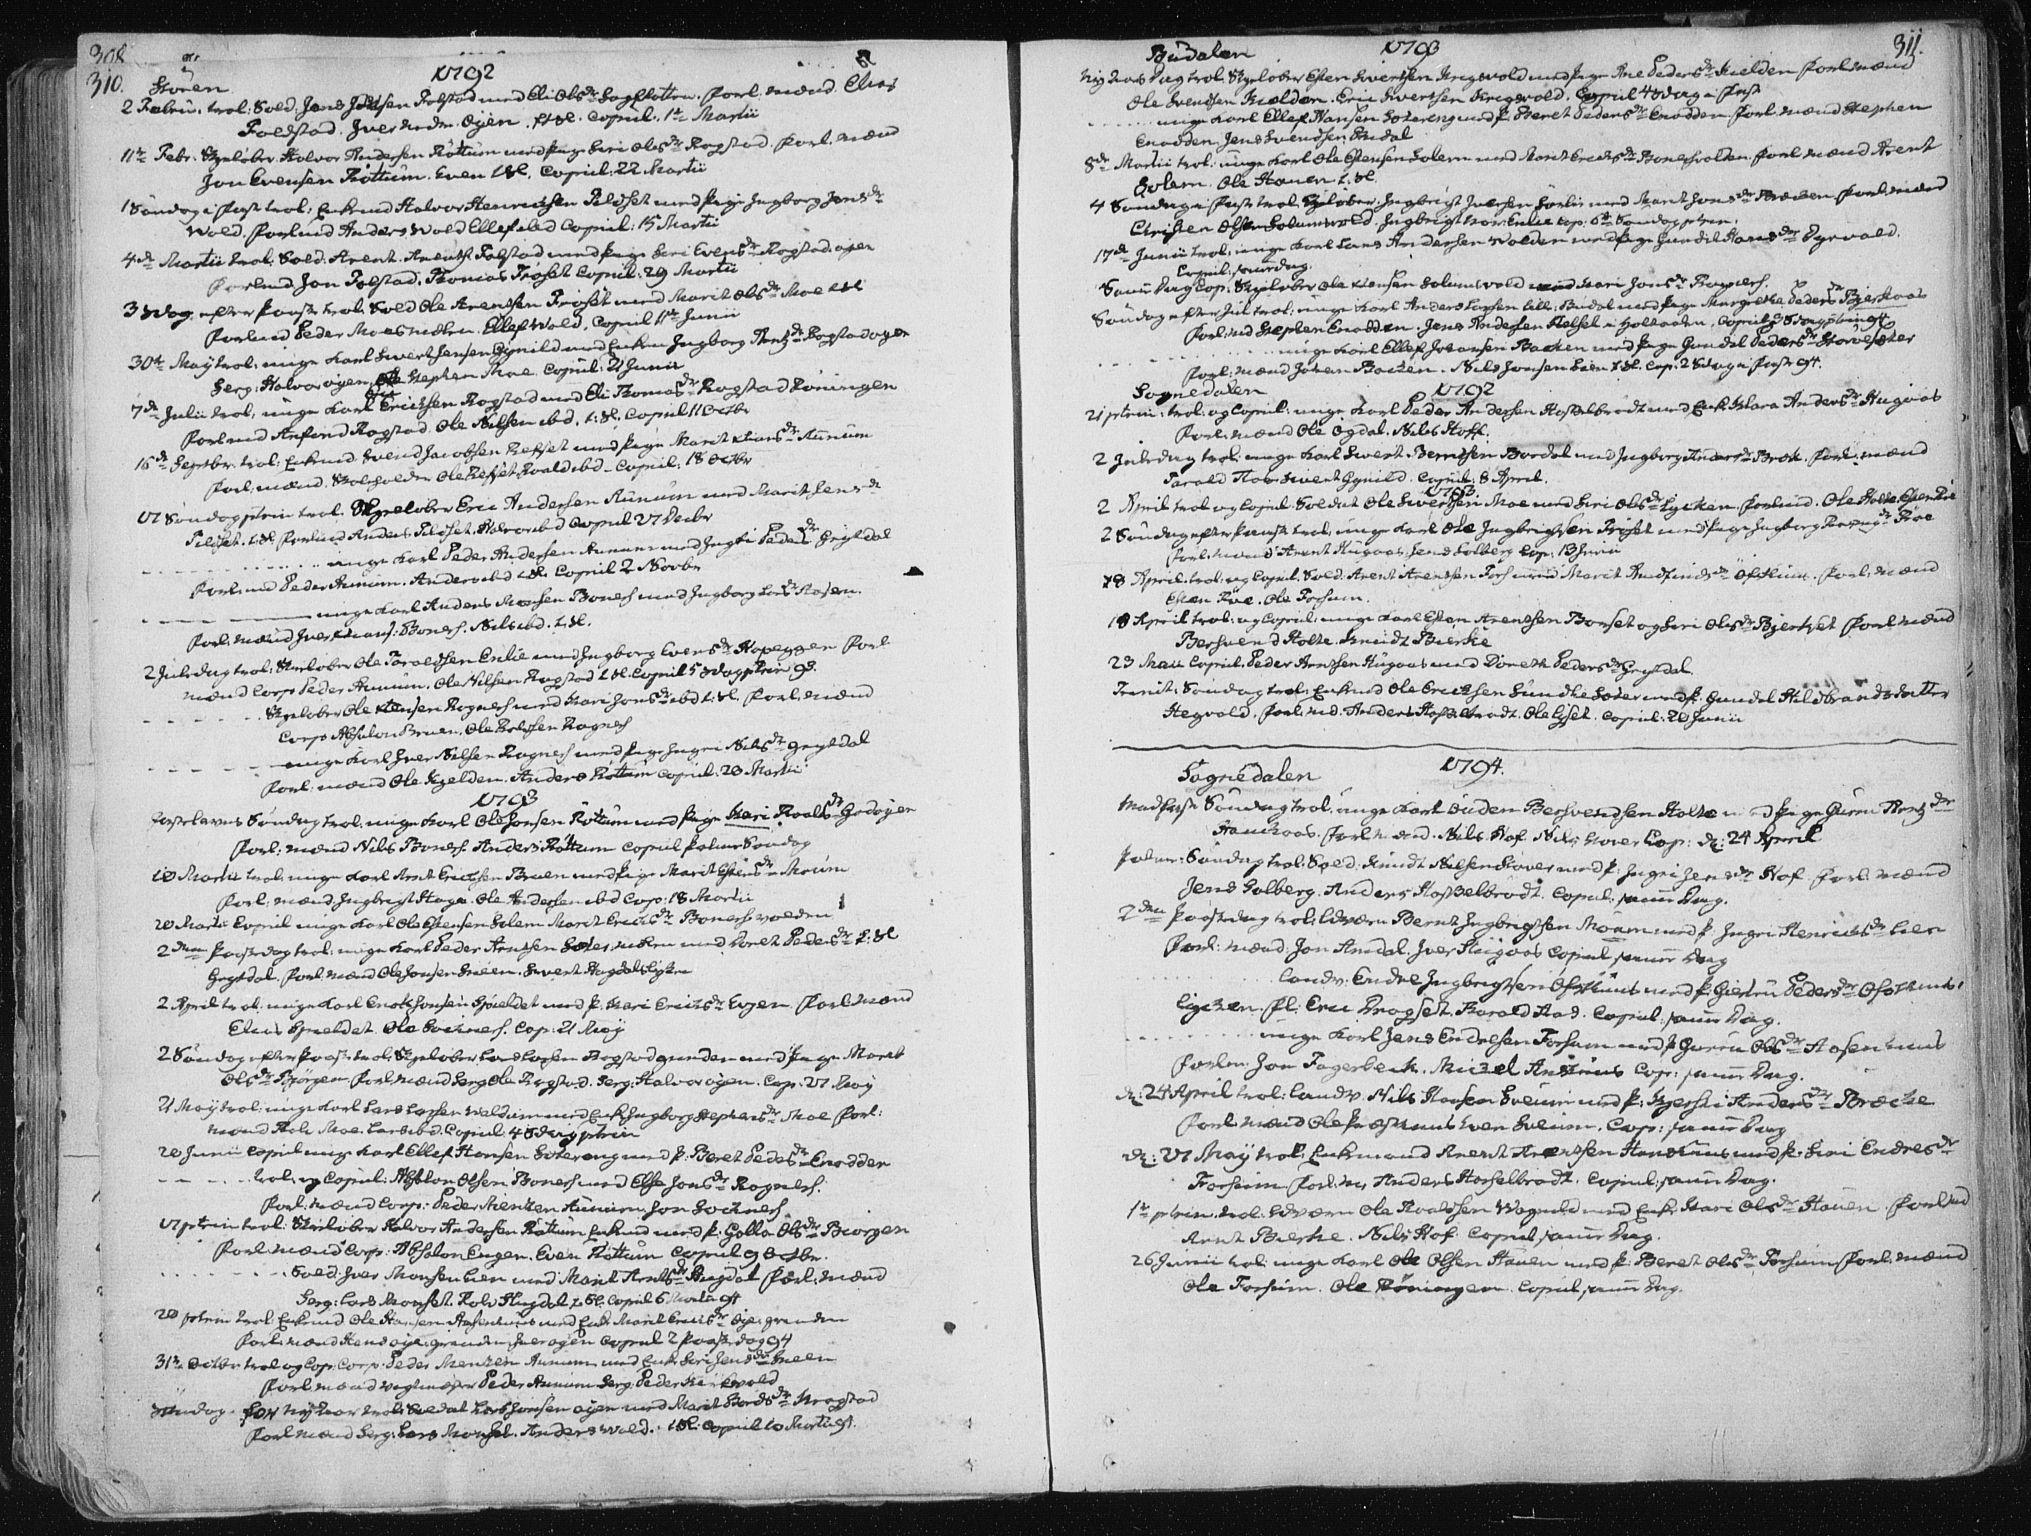 SAT, Ministerialprotokoller, klokkerbøker og fødselsregistre - Sør-Trøndelag, 687/L0992: Parish register (official) no. 687A03 /1, 1788-1815, p. 310-311